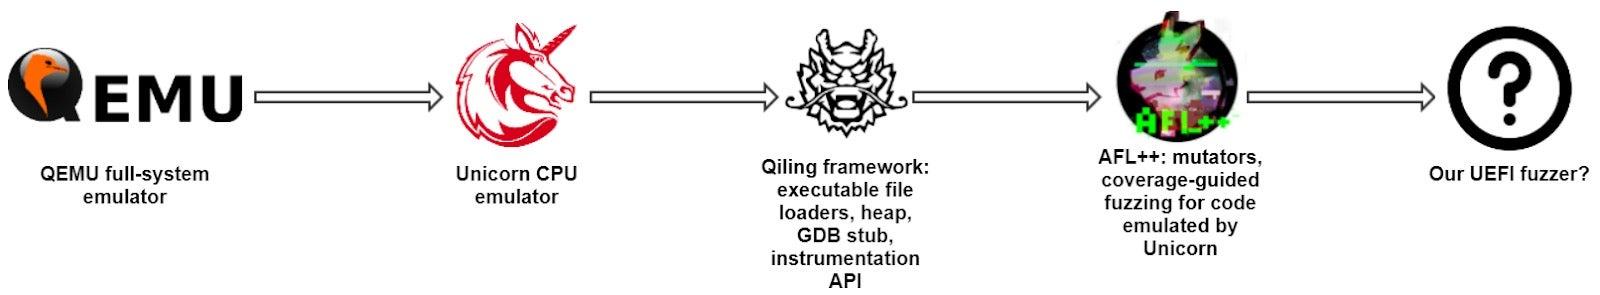 Figure 12 - the roadmap to the UEFI fuzzer